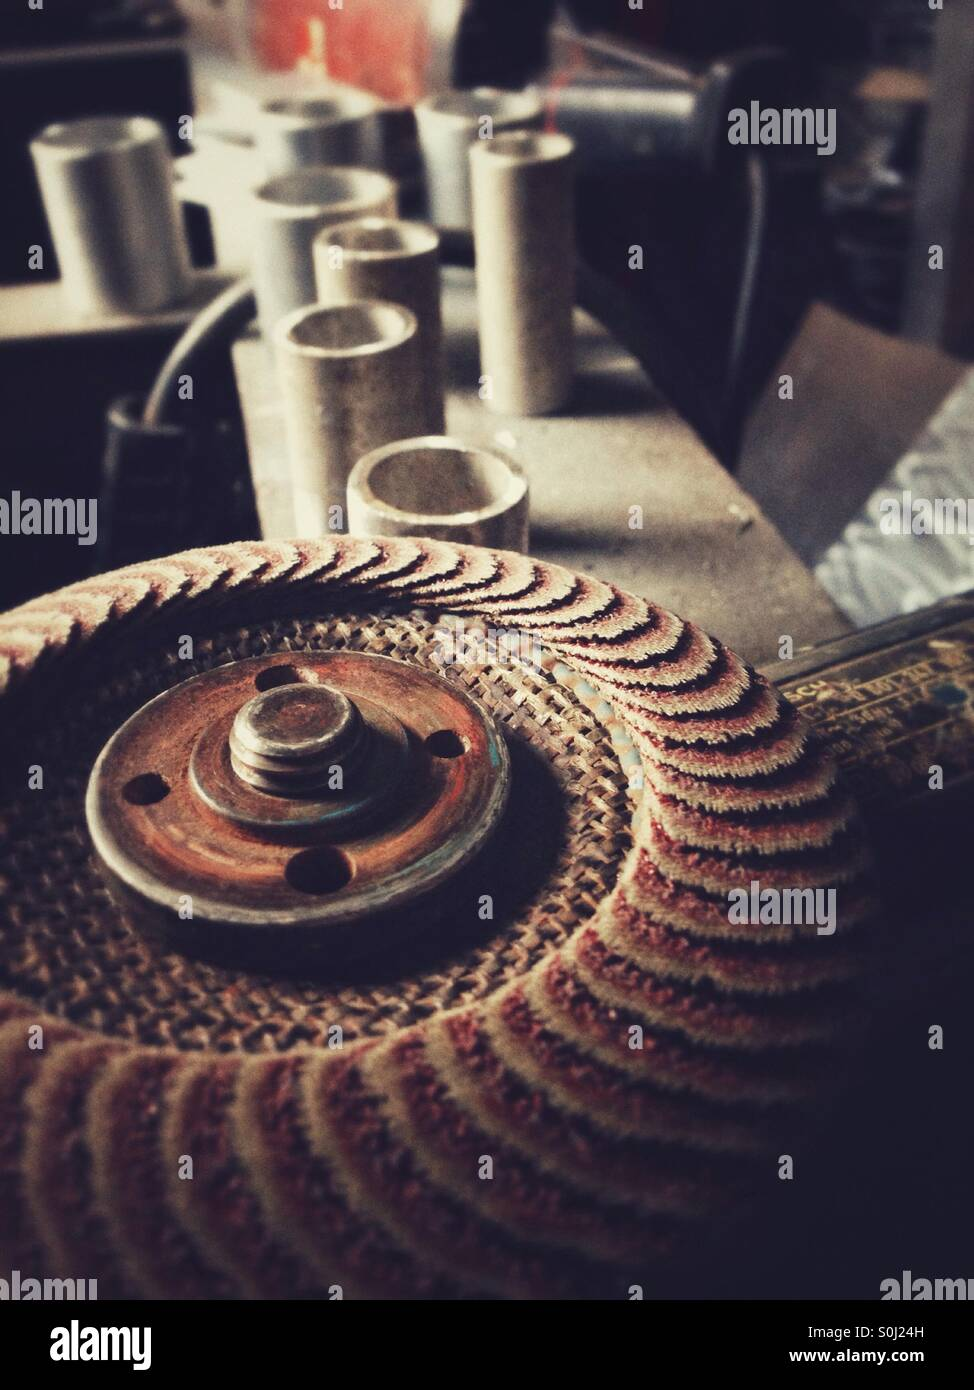 Angle grinder - Stock Image